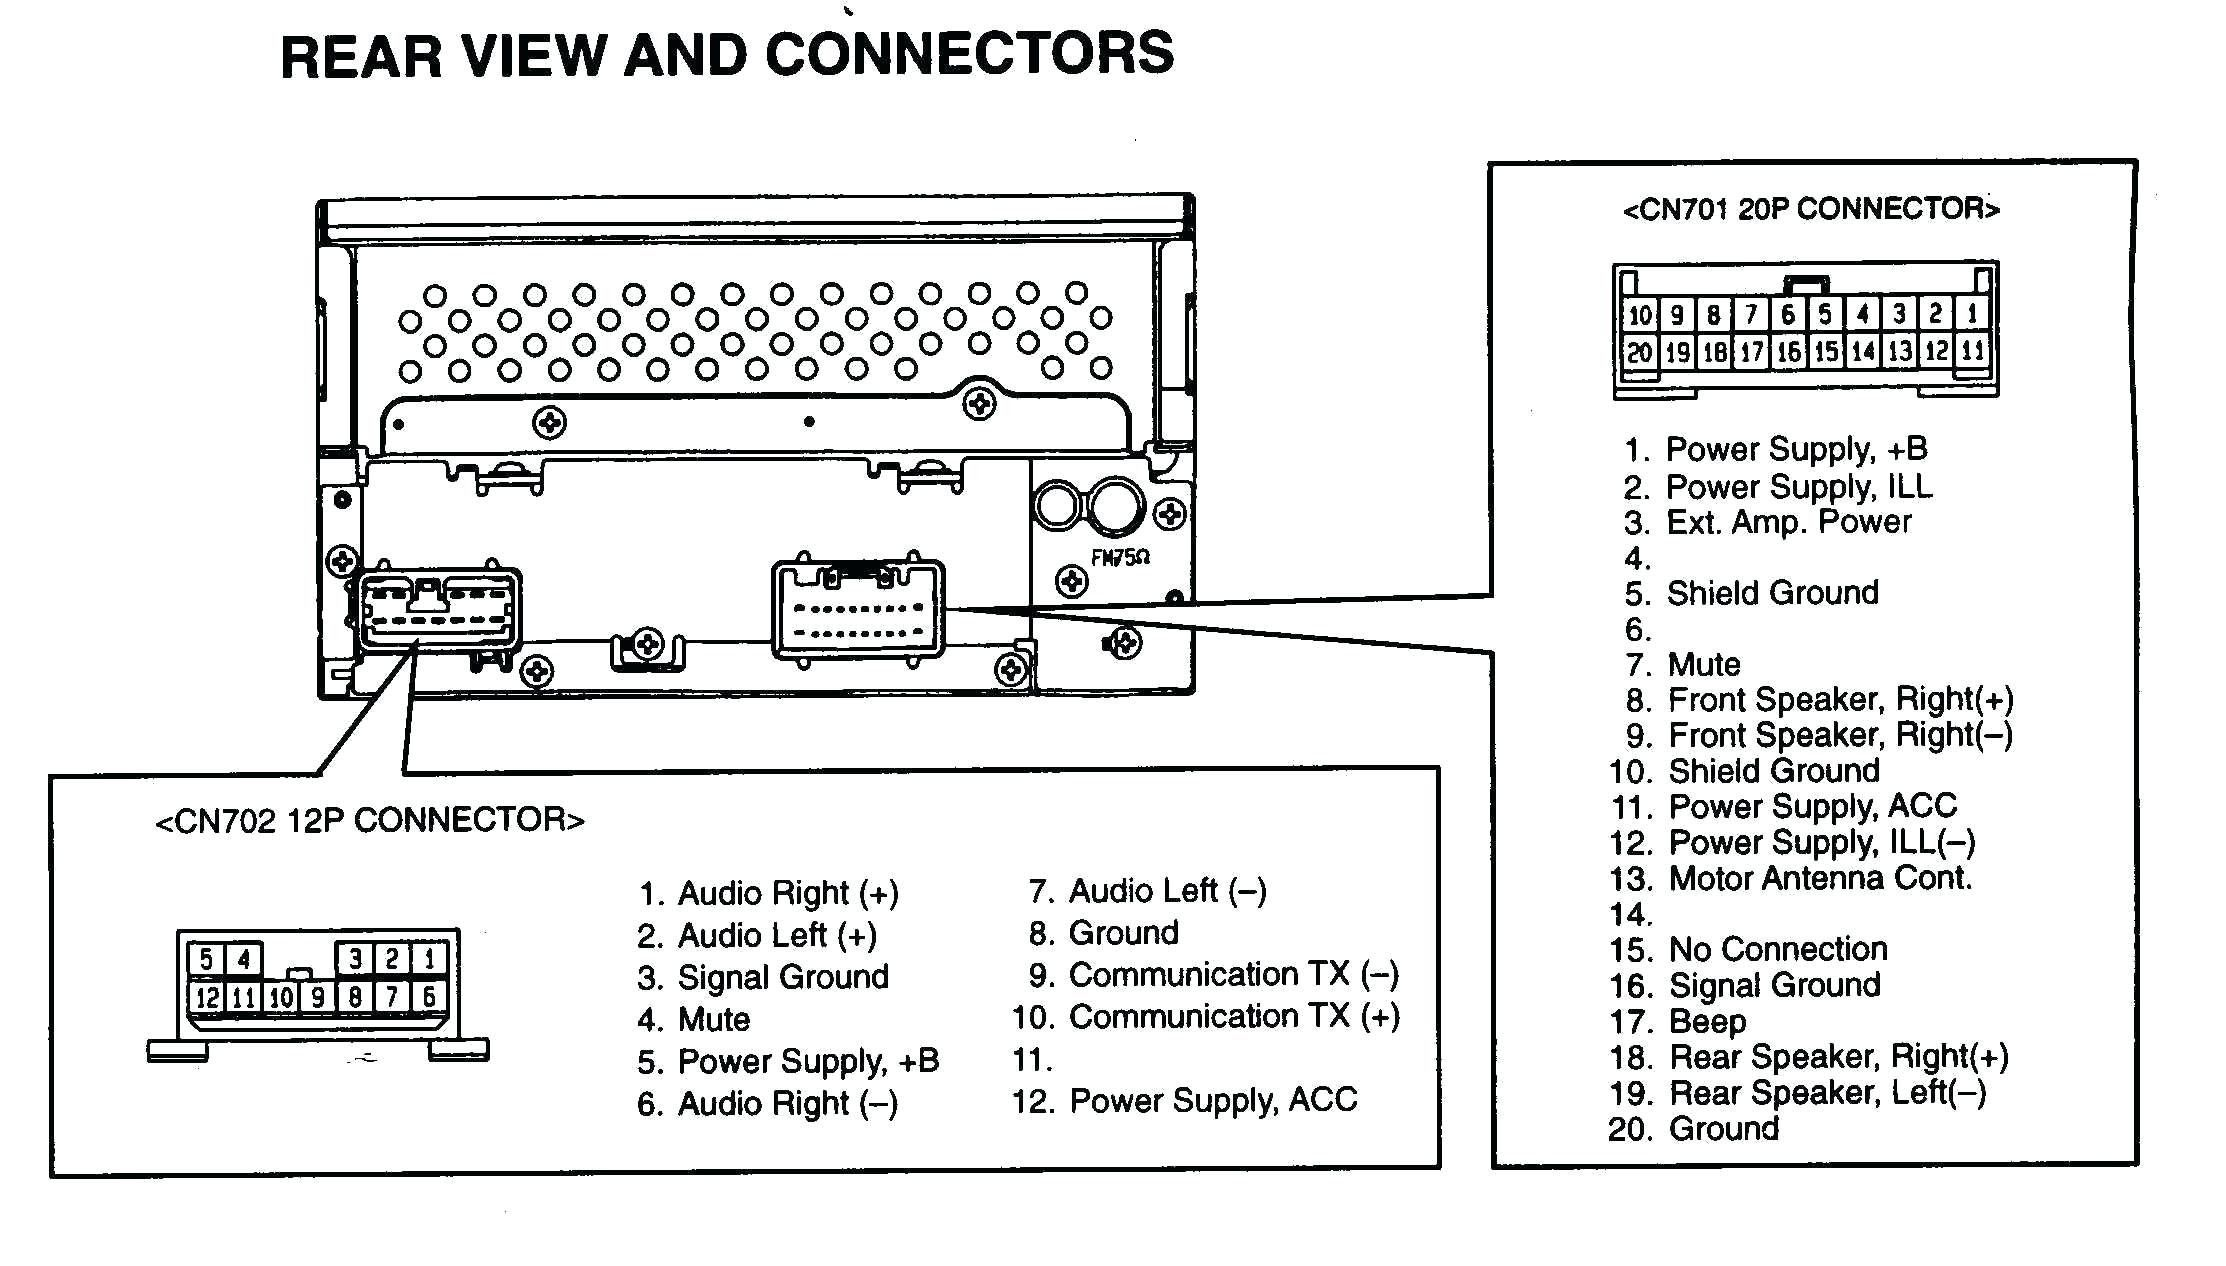 hight resolution of 7 2 amp motor wiring diagram wiring diagram pass 7 2 amp motor wiring diagram